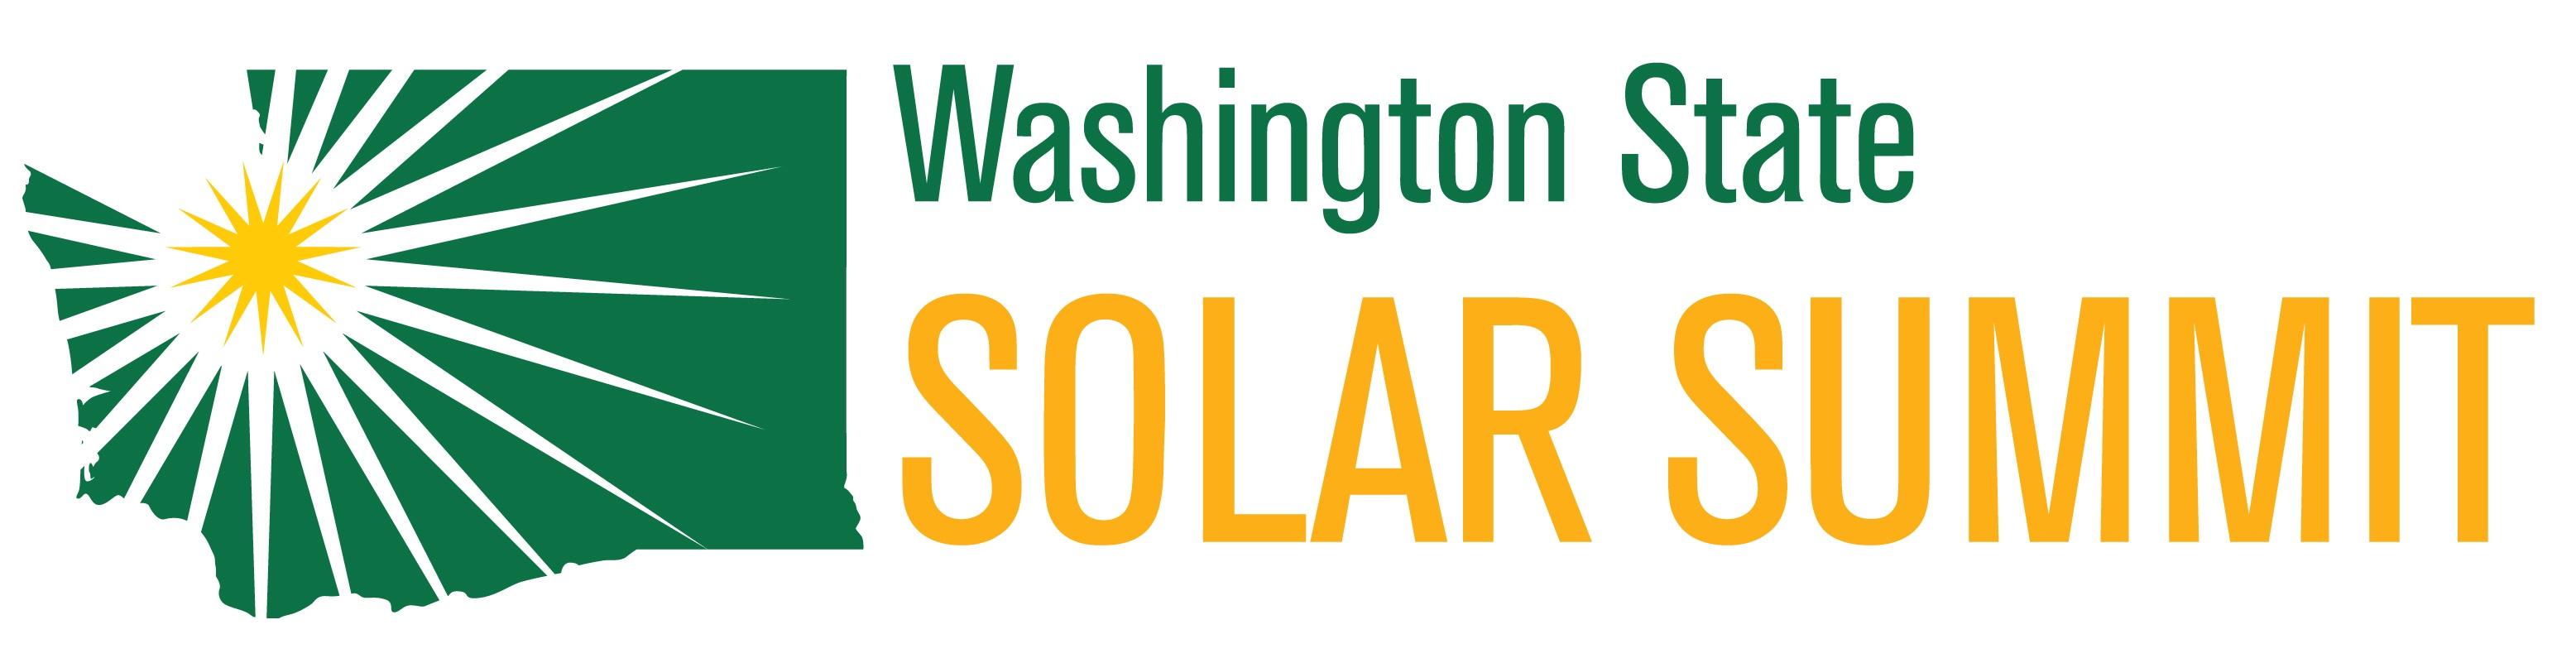 Washington_State_Solar_Summit_Logo-cropped_(1)_(2).jpg